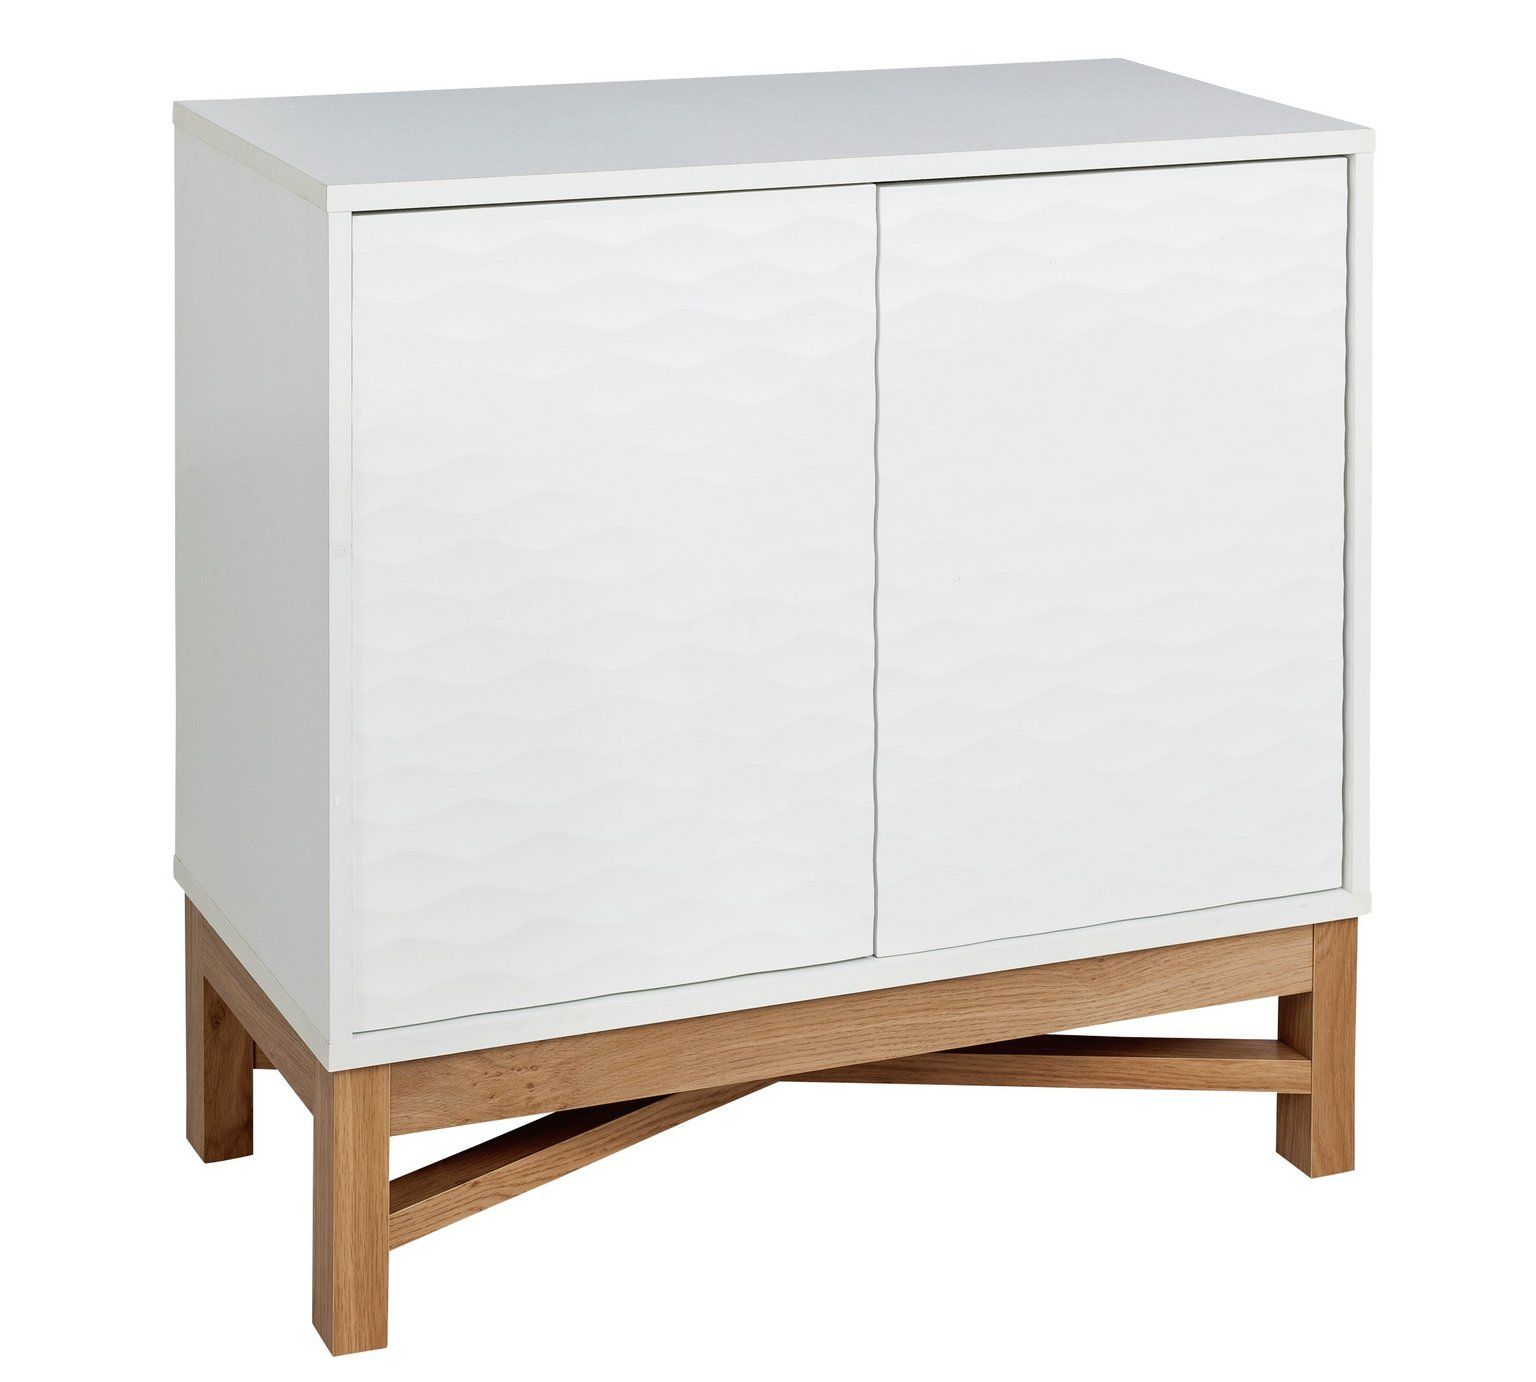 Buy Argos Home Zander Textured Small Sideboard White Oak Effect Sideboards Argos White Sideboard Small Sideboard Argos Home